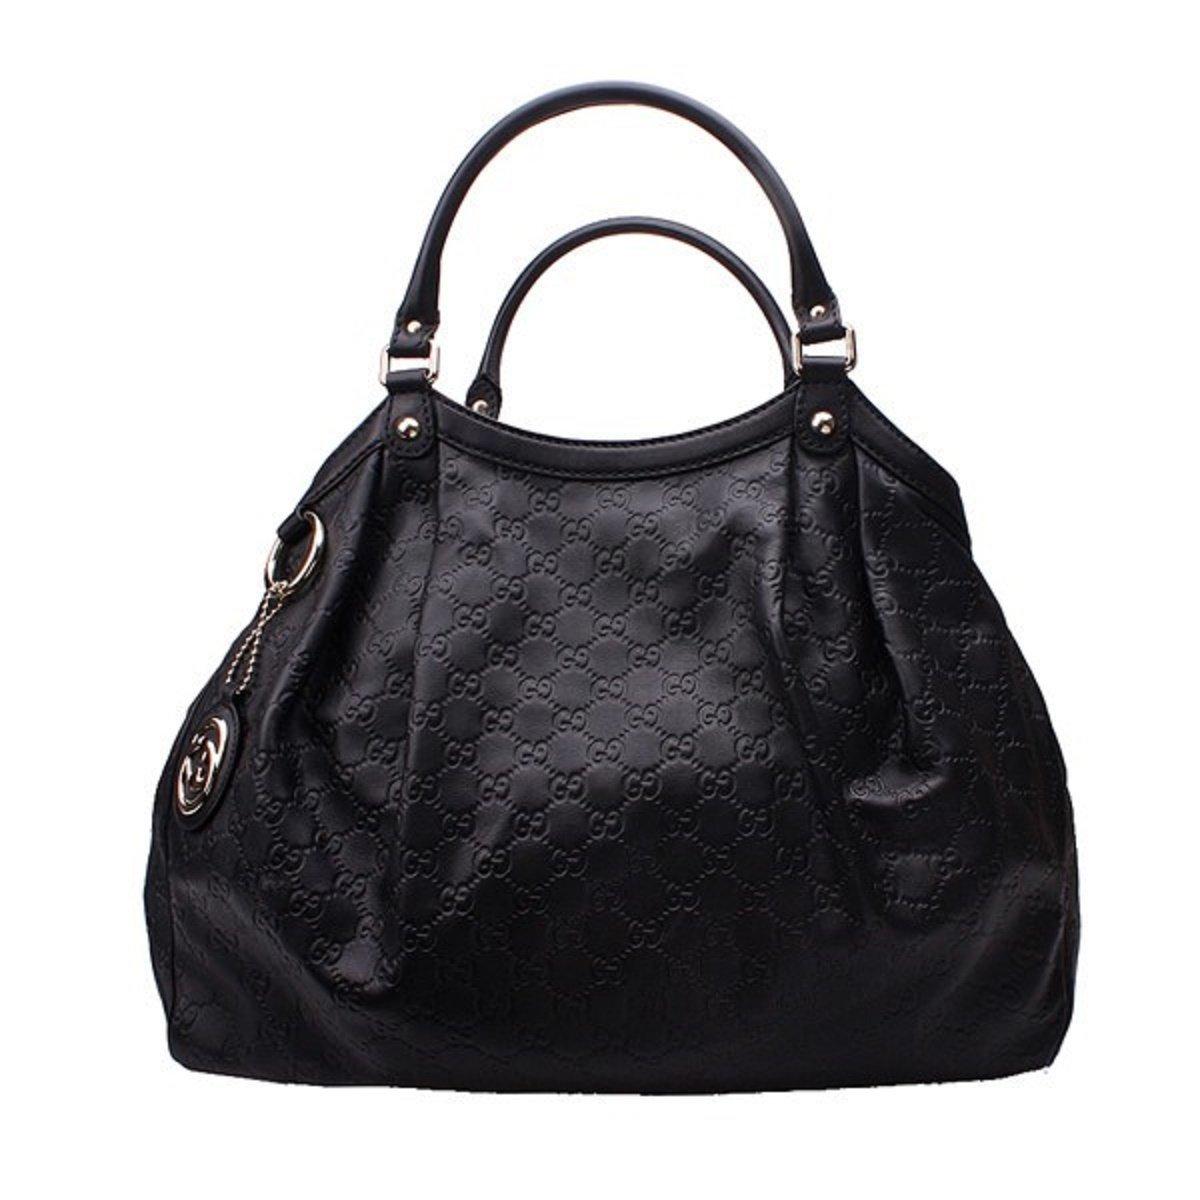 a77e81a62046 Amazon.com: Gucci Sukey Guccissima Black Leather Large Tote Bag Handbag:  Shoes